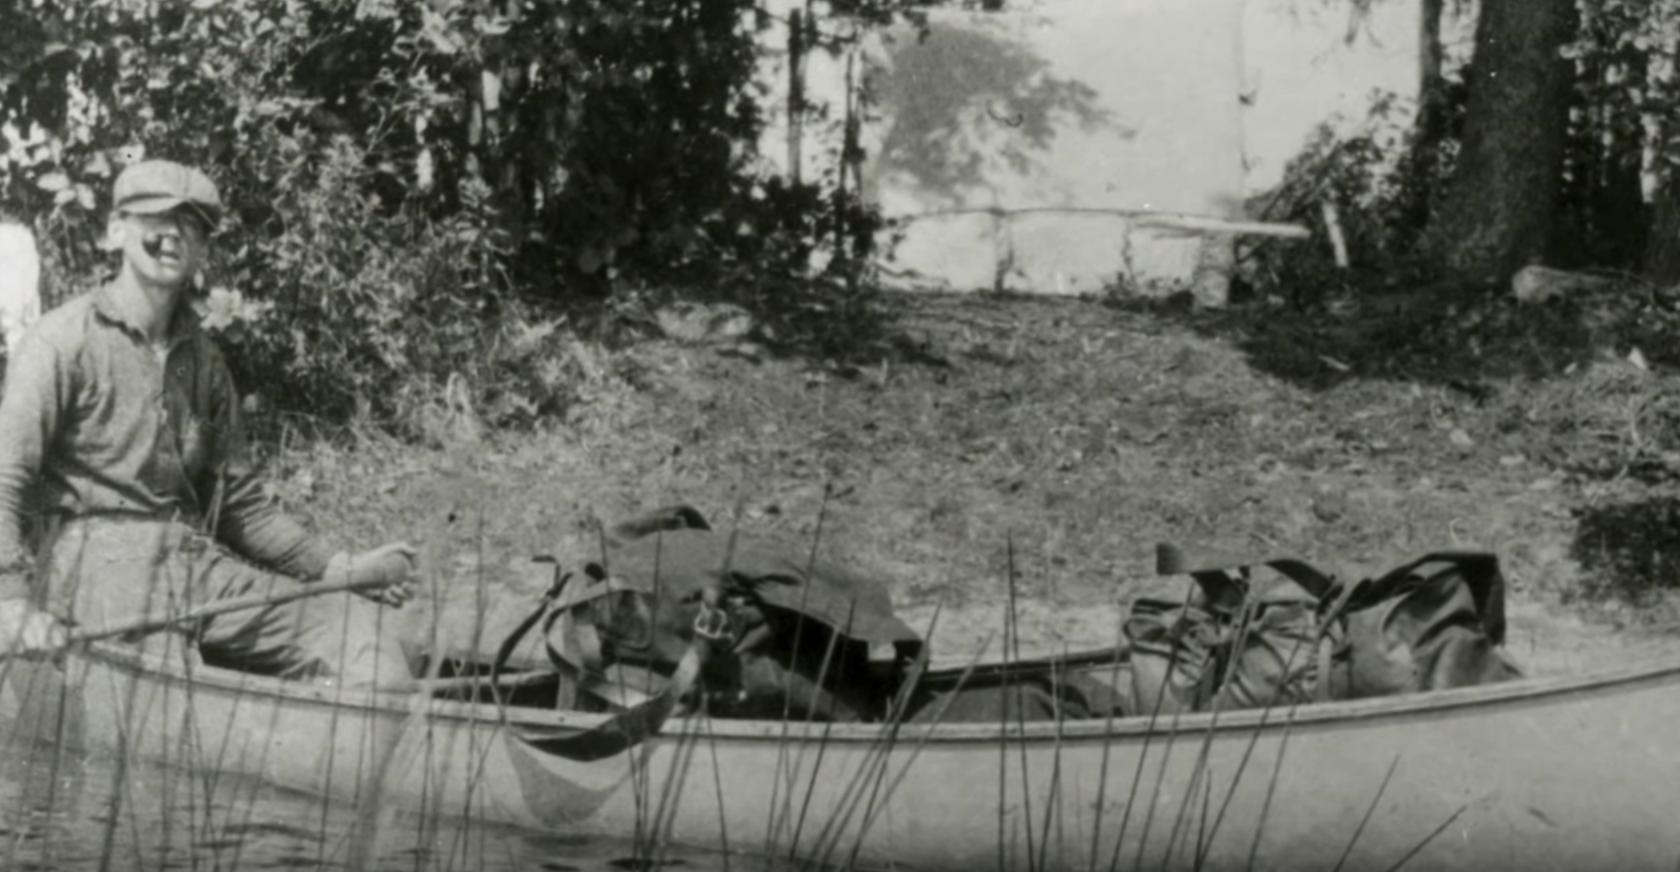 Tom in a canoe